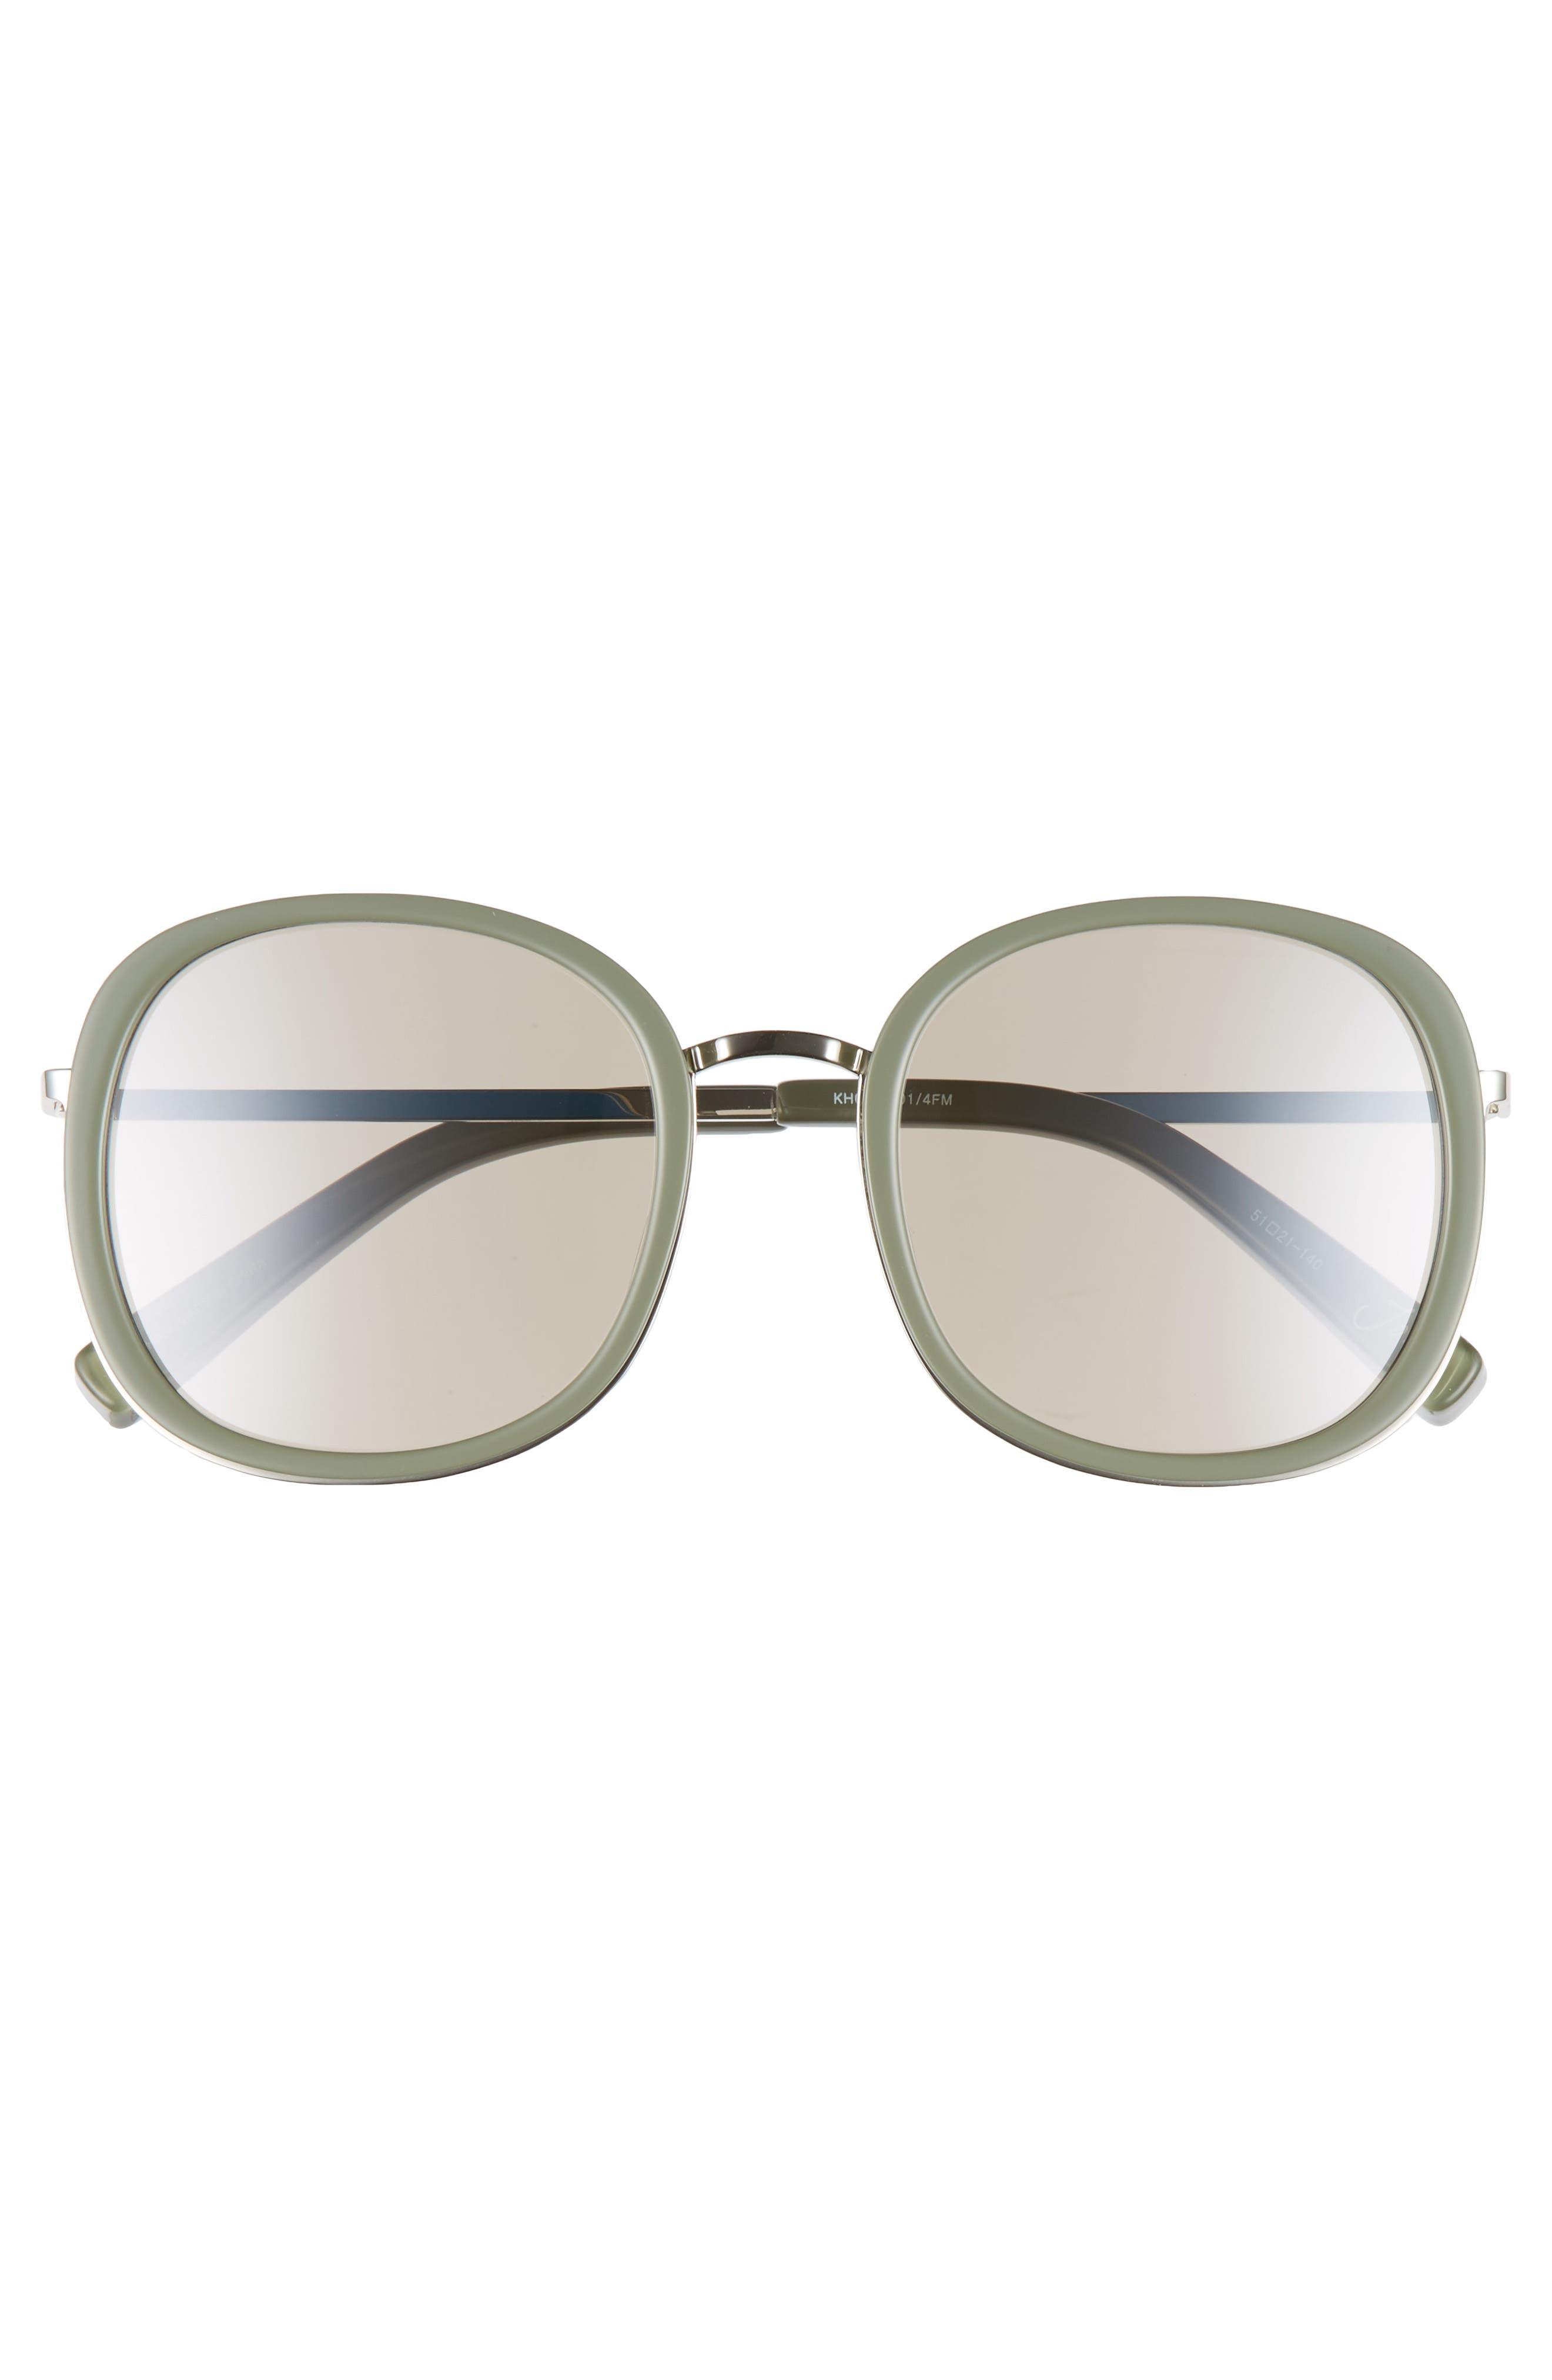 Jones 51mm Round Sunglasses,                             Alternate thumbnail 3, color,                             Khaki And Silver